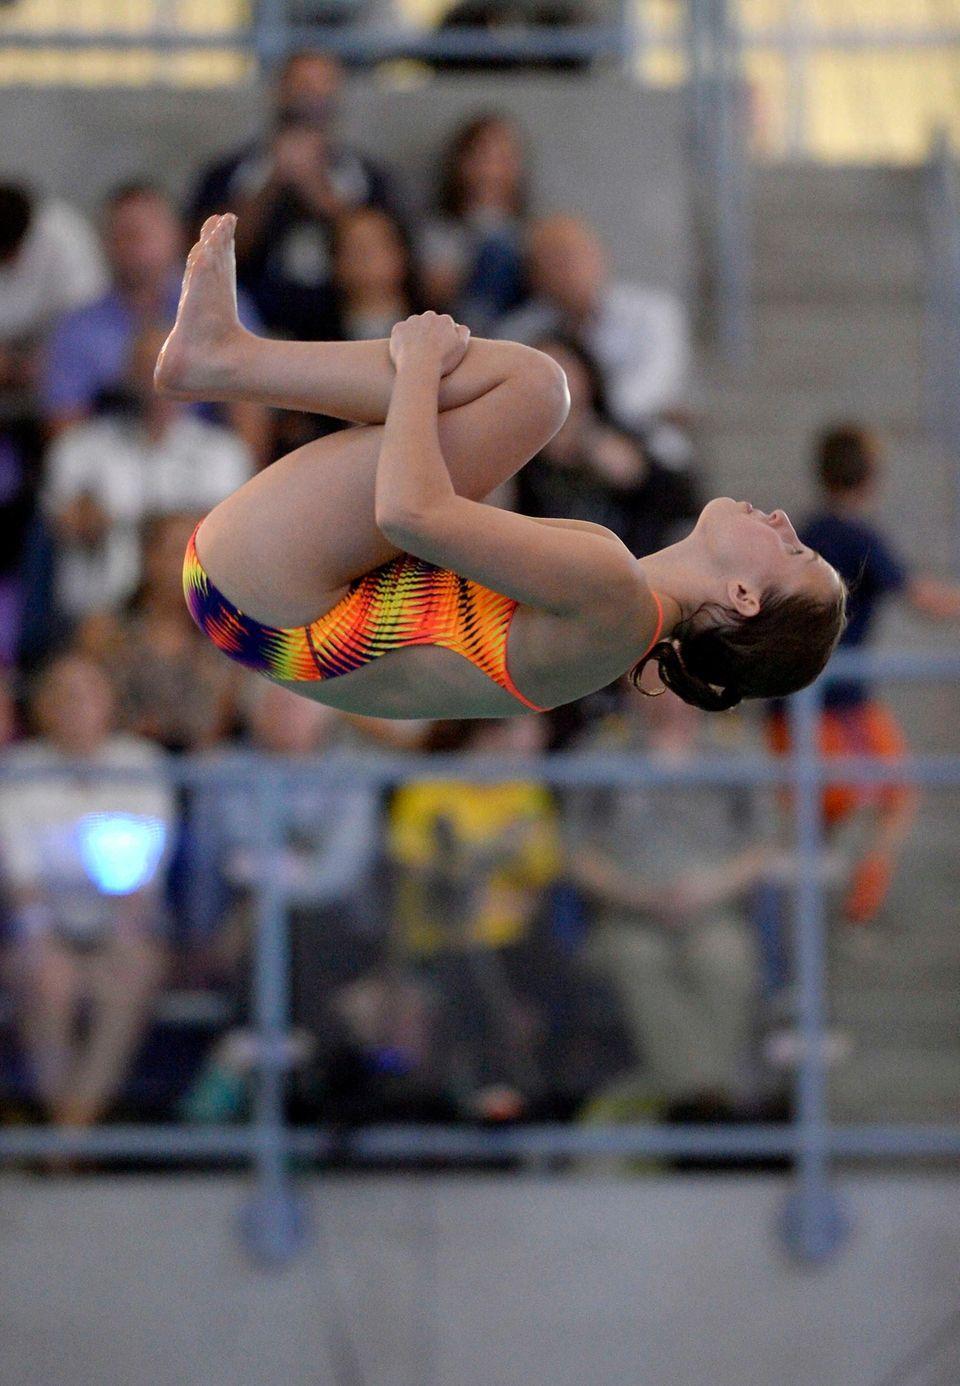 Sayville-Bayport-Blue Point's Megan Romano performs a dive during